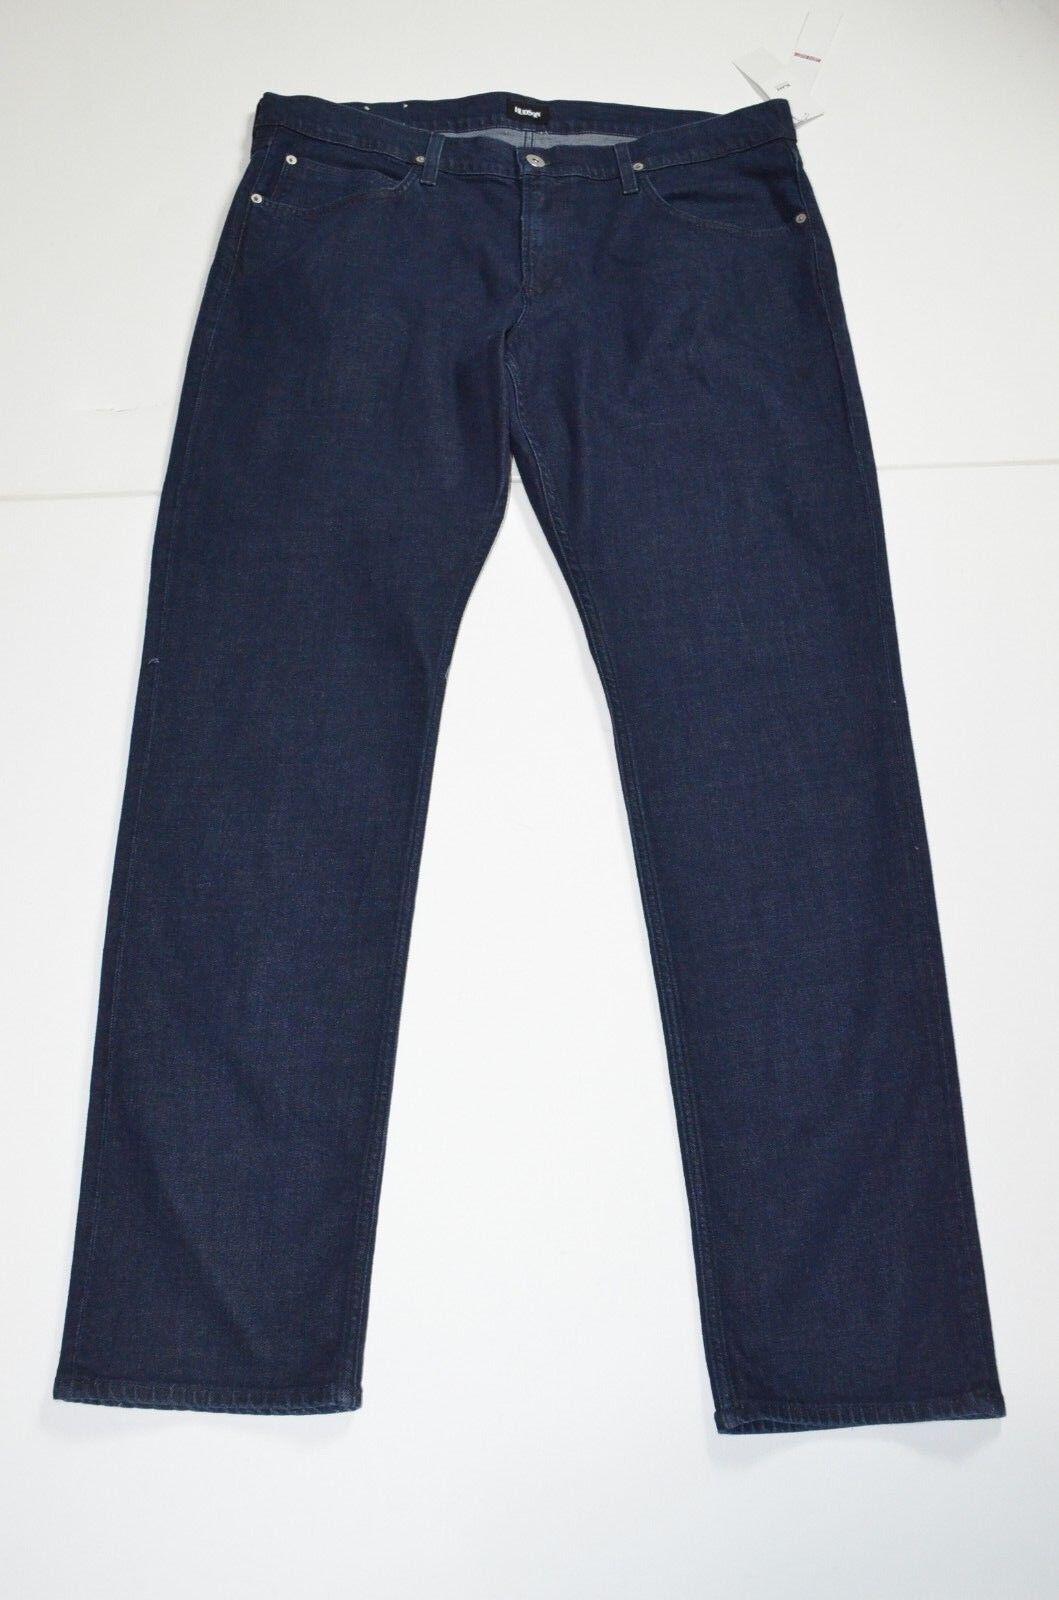 MSRP 175 NWT Hudson Blake Dark Wash Jeans Slim Straight Sz 40 x 35